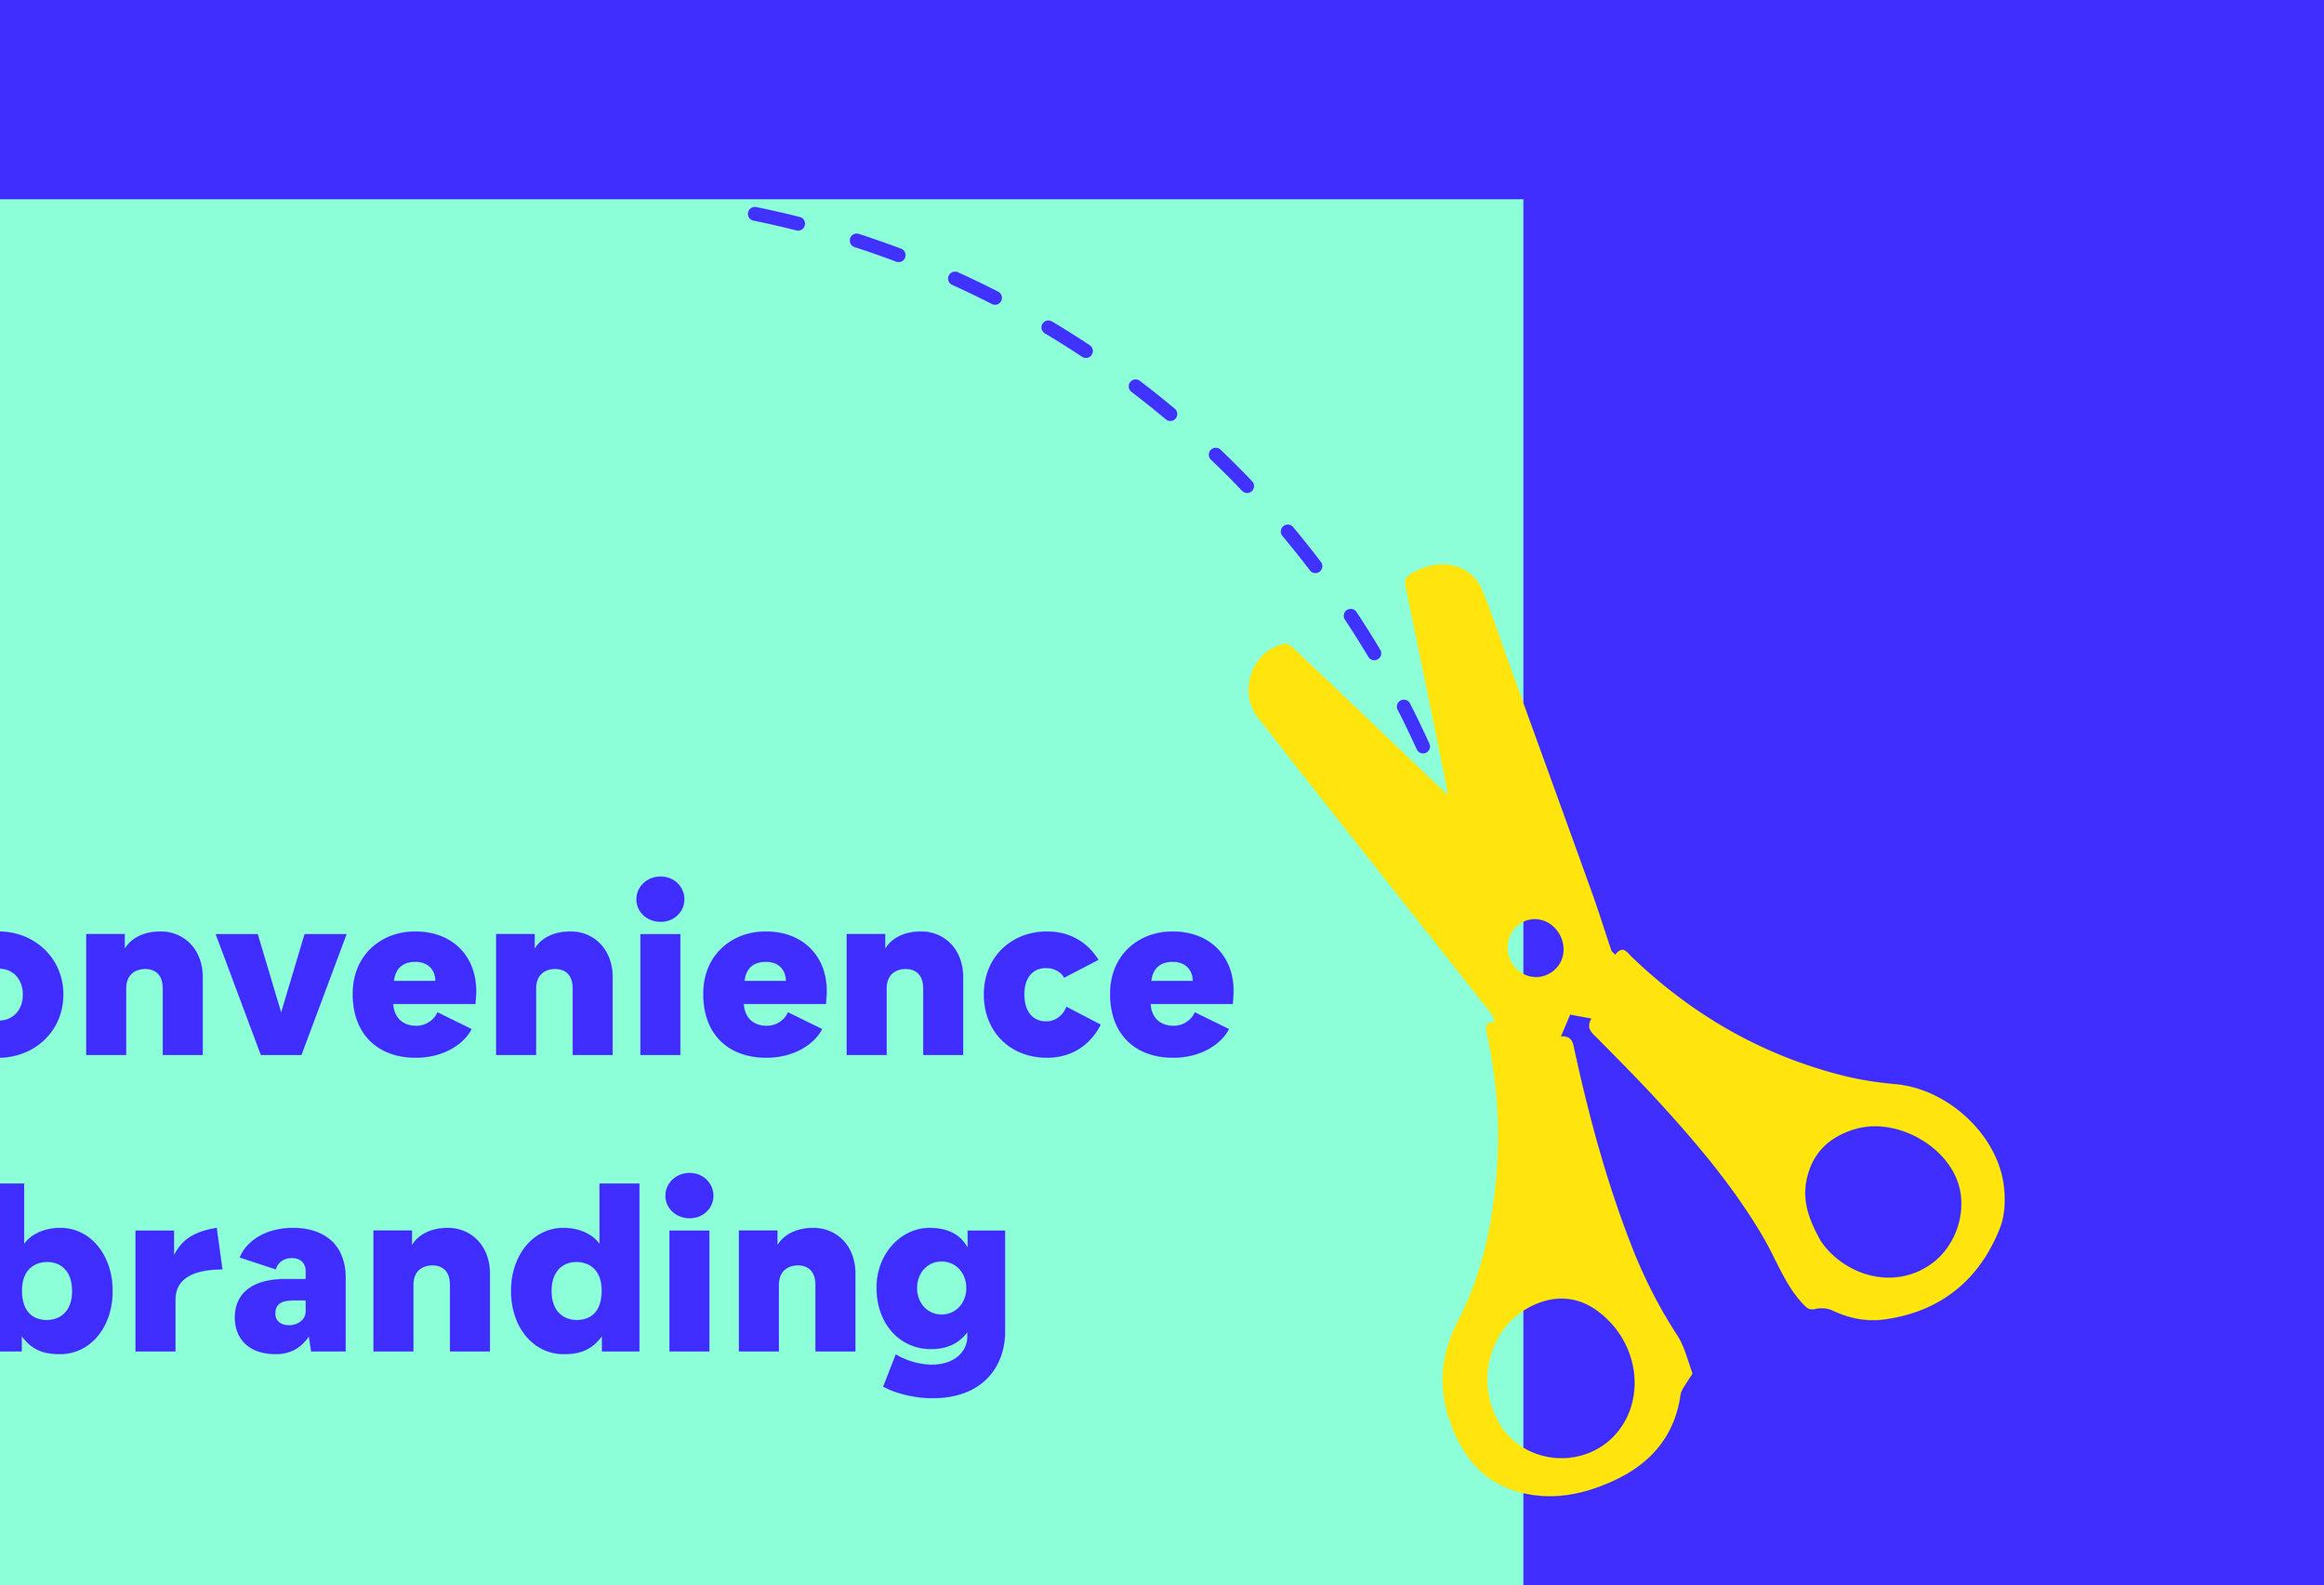 Convenience_Branding.jpg